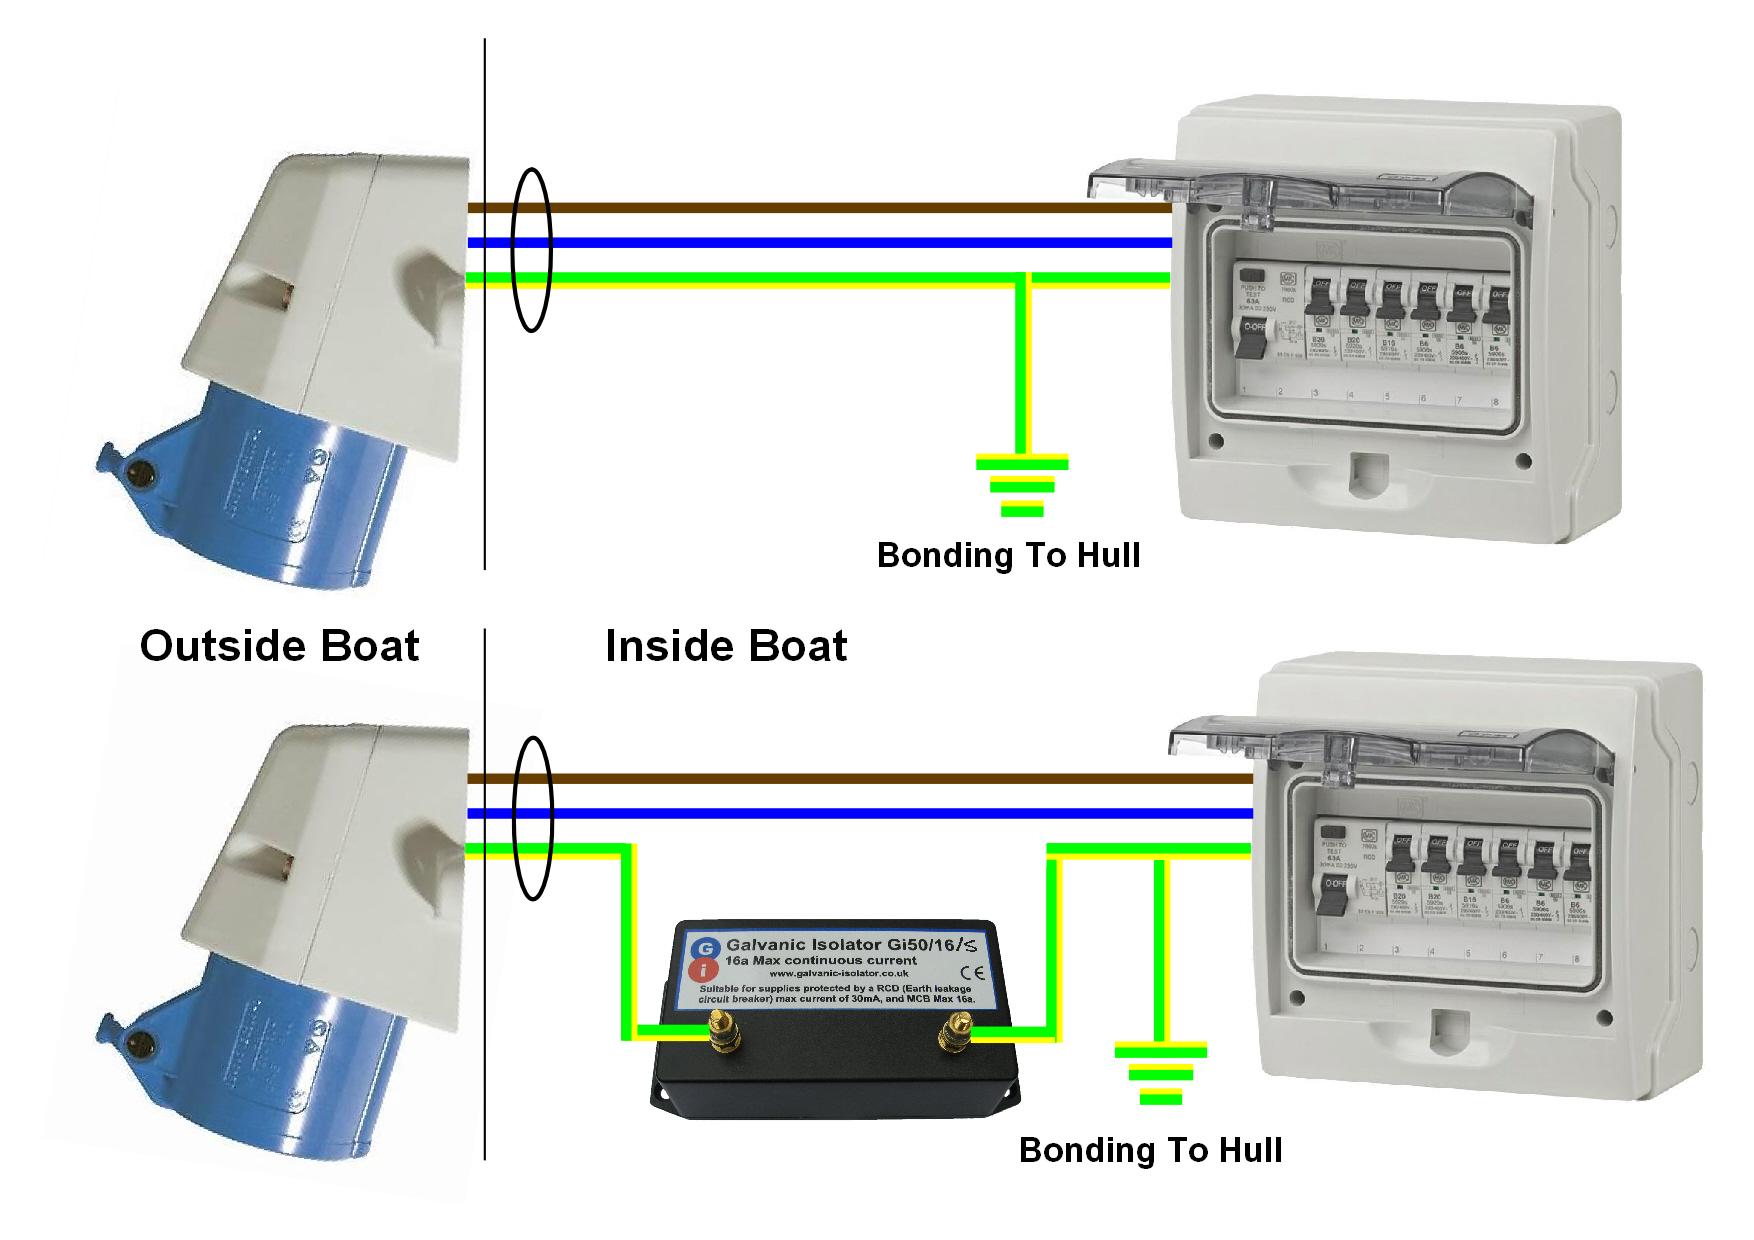 K9 Car Alarm Wiring Diagram Block And Schematic Diagrams For Narrowboat Choice Image Circuit